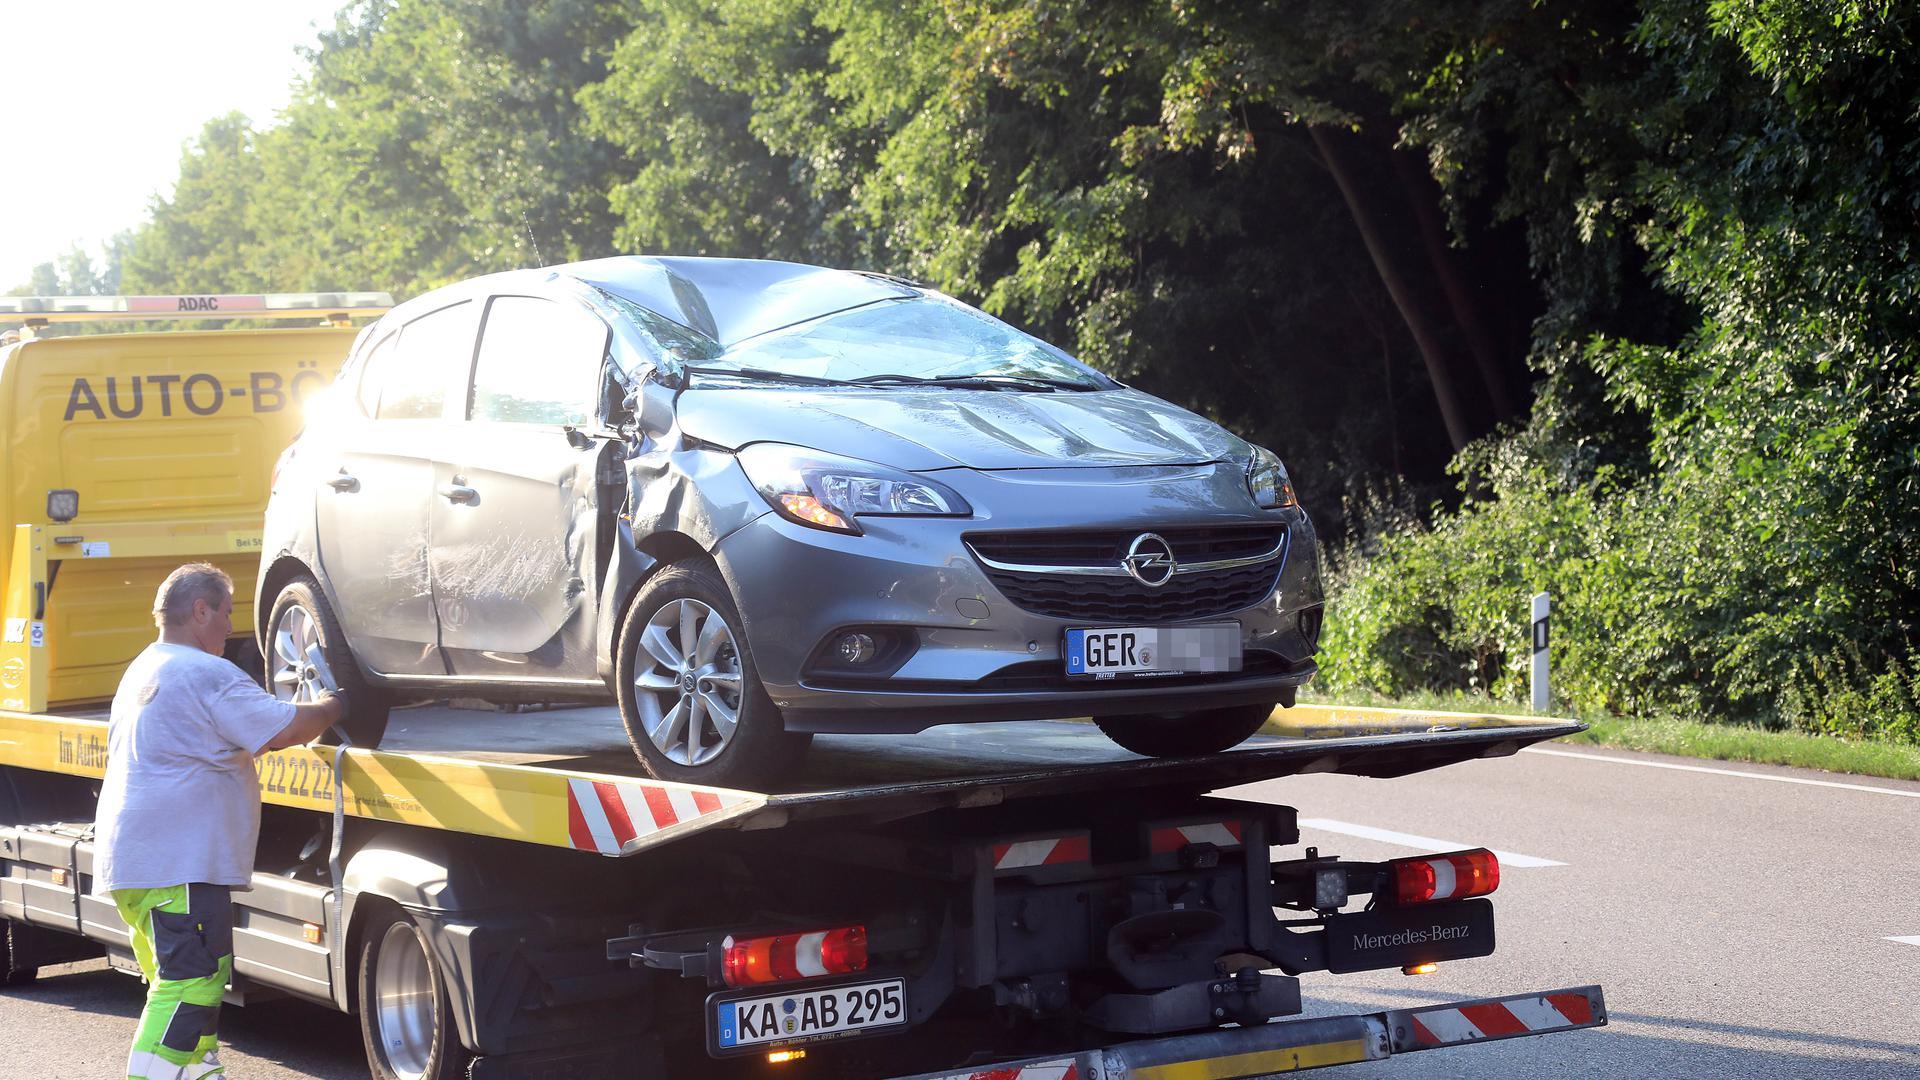 Karlsruhe Unfall Heute